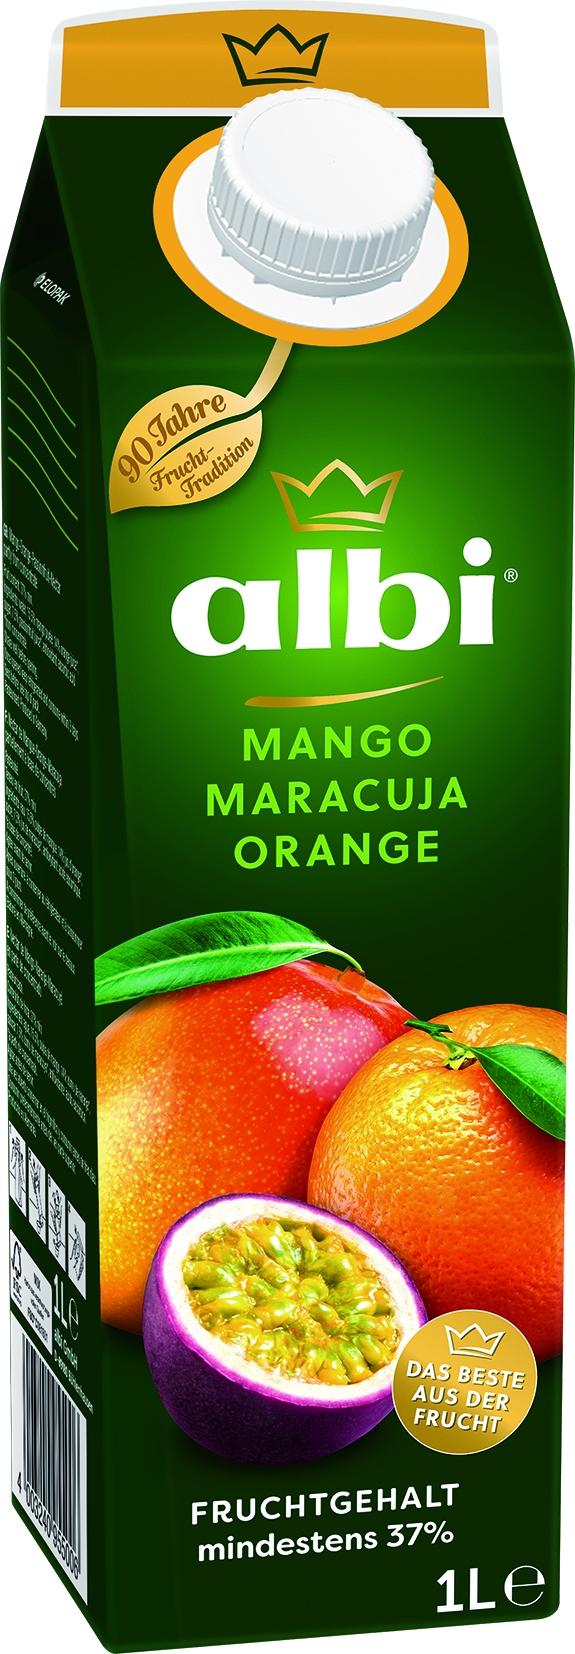 Mango Maracuja Saft